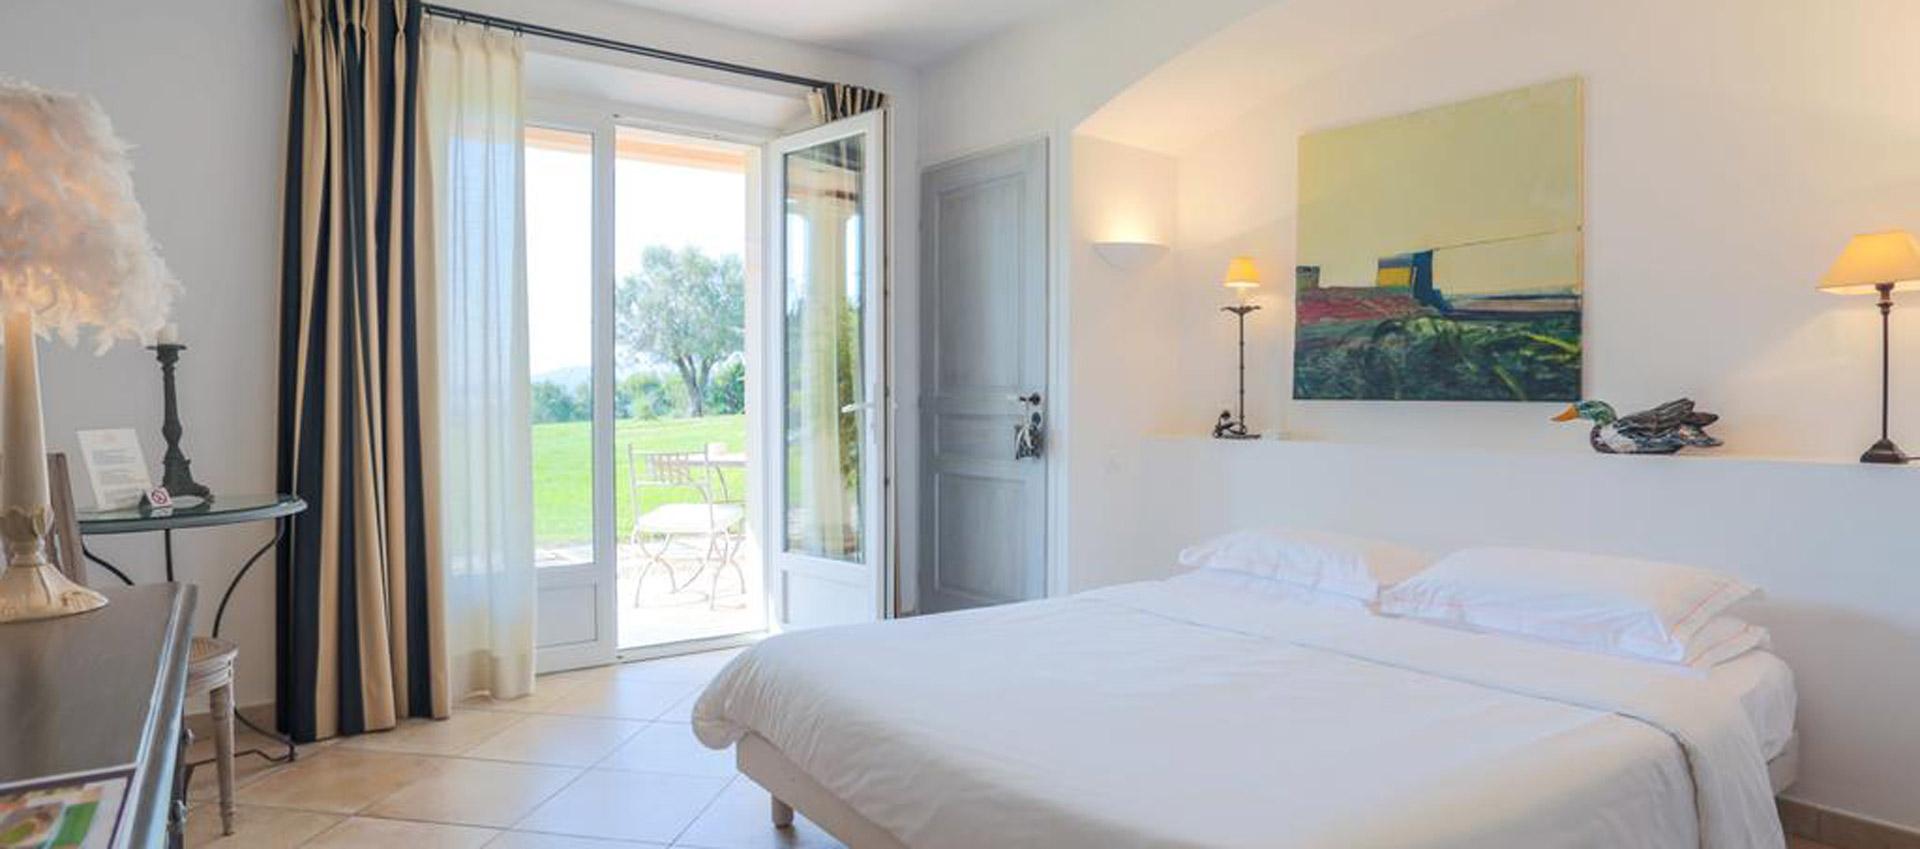 Hotel Villa Les Rosiers 3